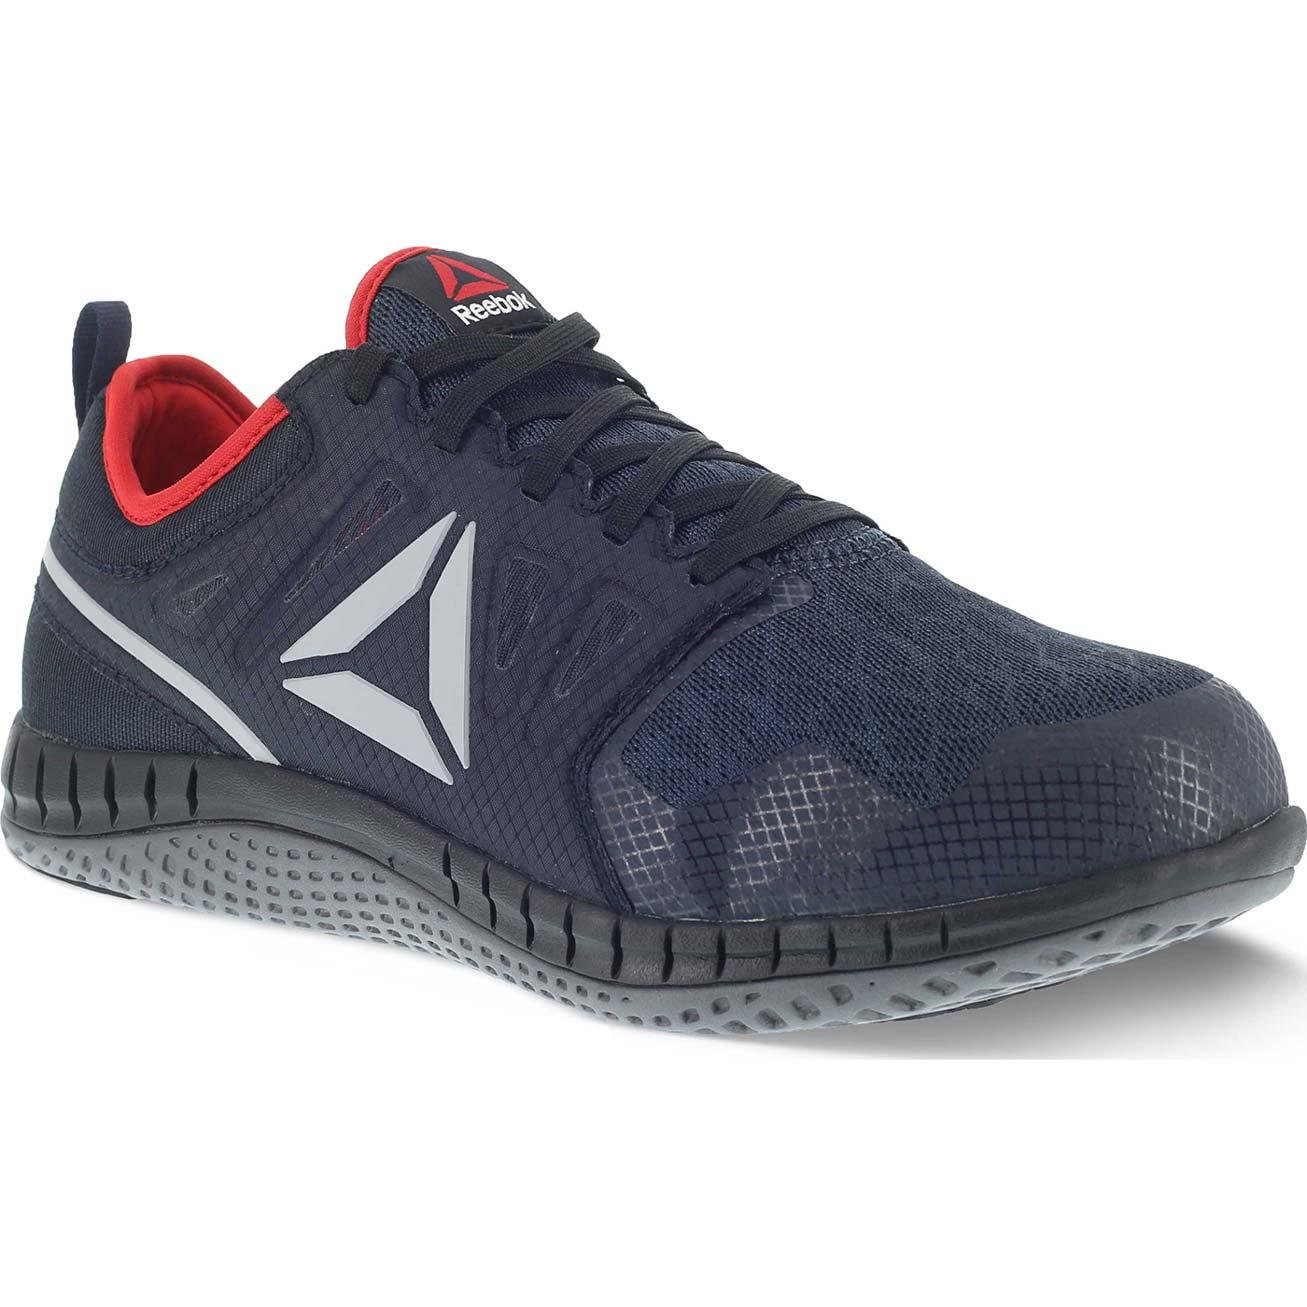 Steel Toe Tennis Shoes Size